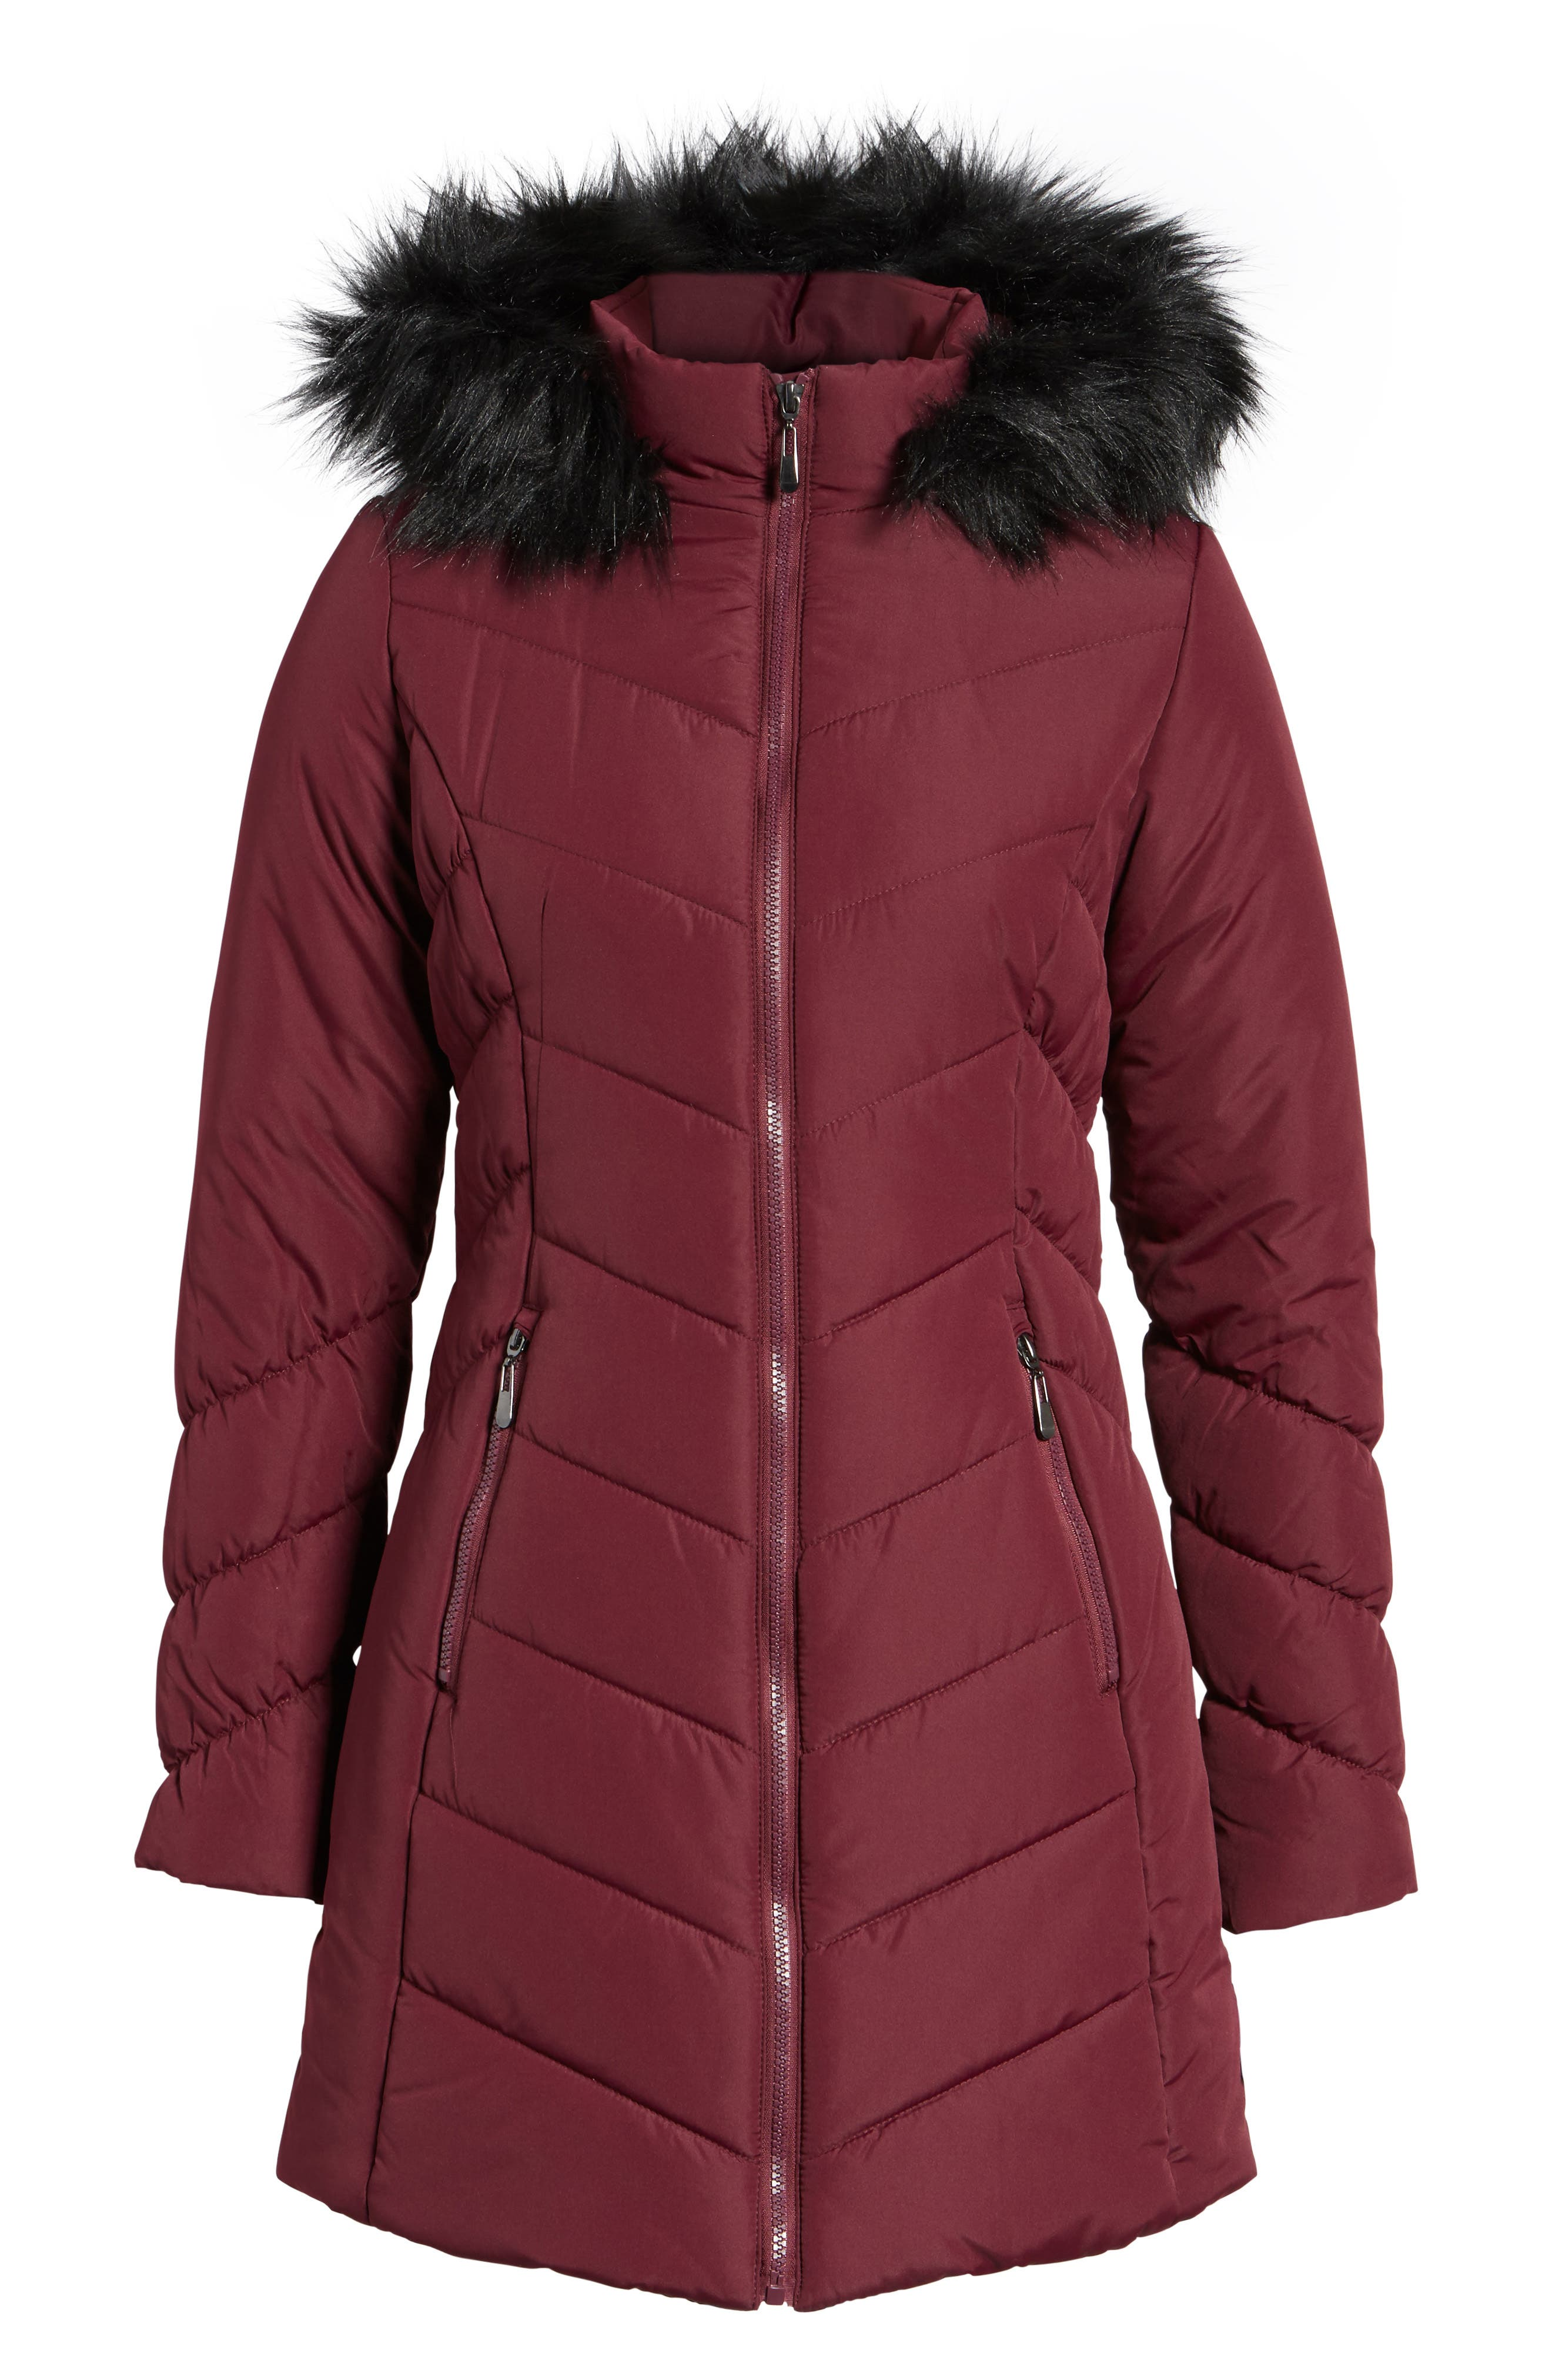 Faux Fur Trim Hooded Puffer Jacket,                             Alternate thumbnail 5, color,                             930